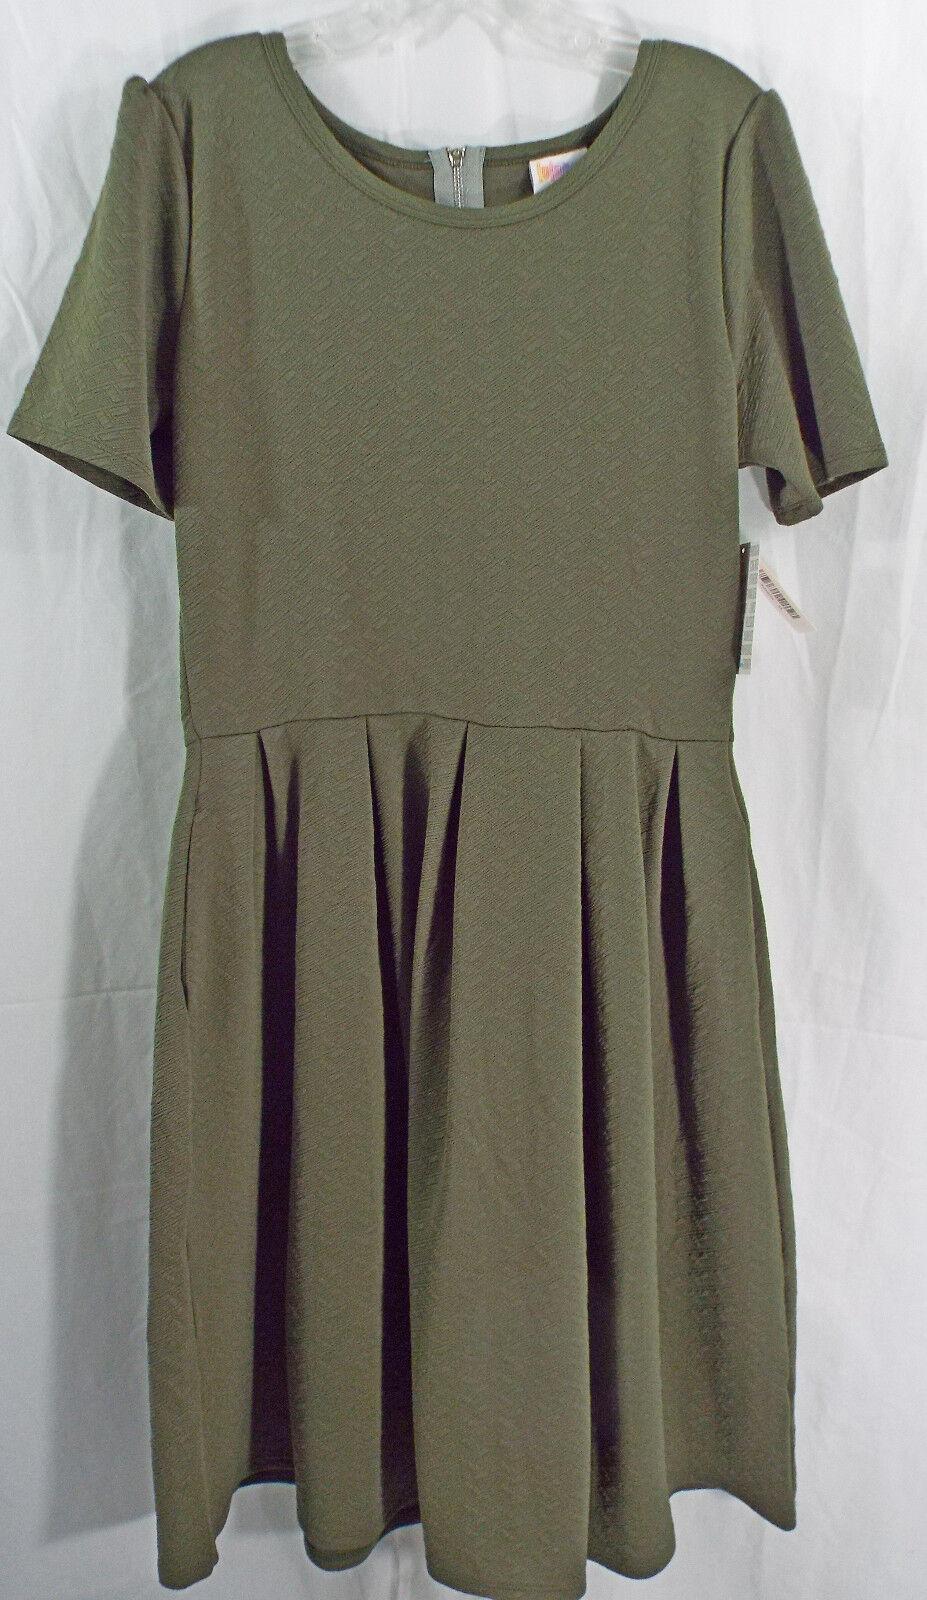 damen LuLaRoe Dress XL Amelia Olive Grün Embossed Diamond Pattern NWT